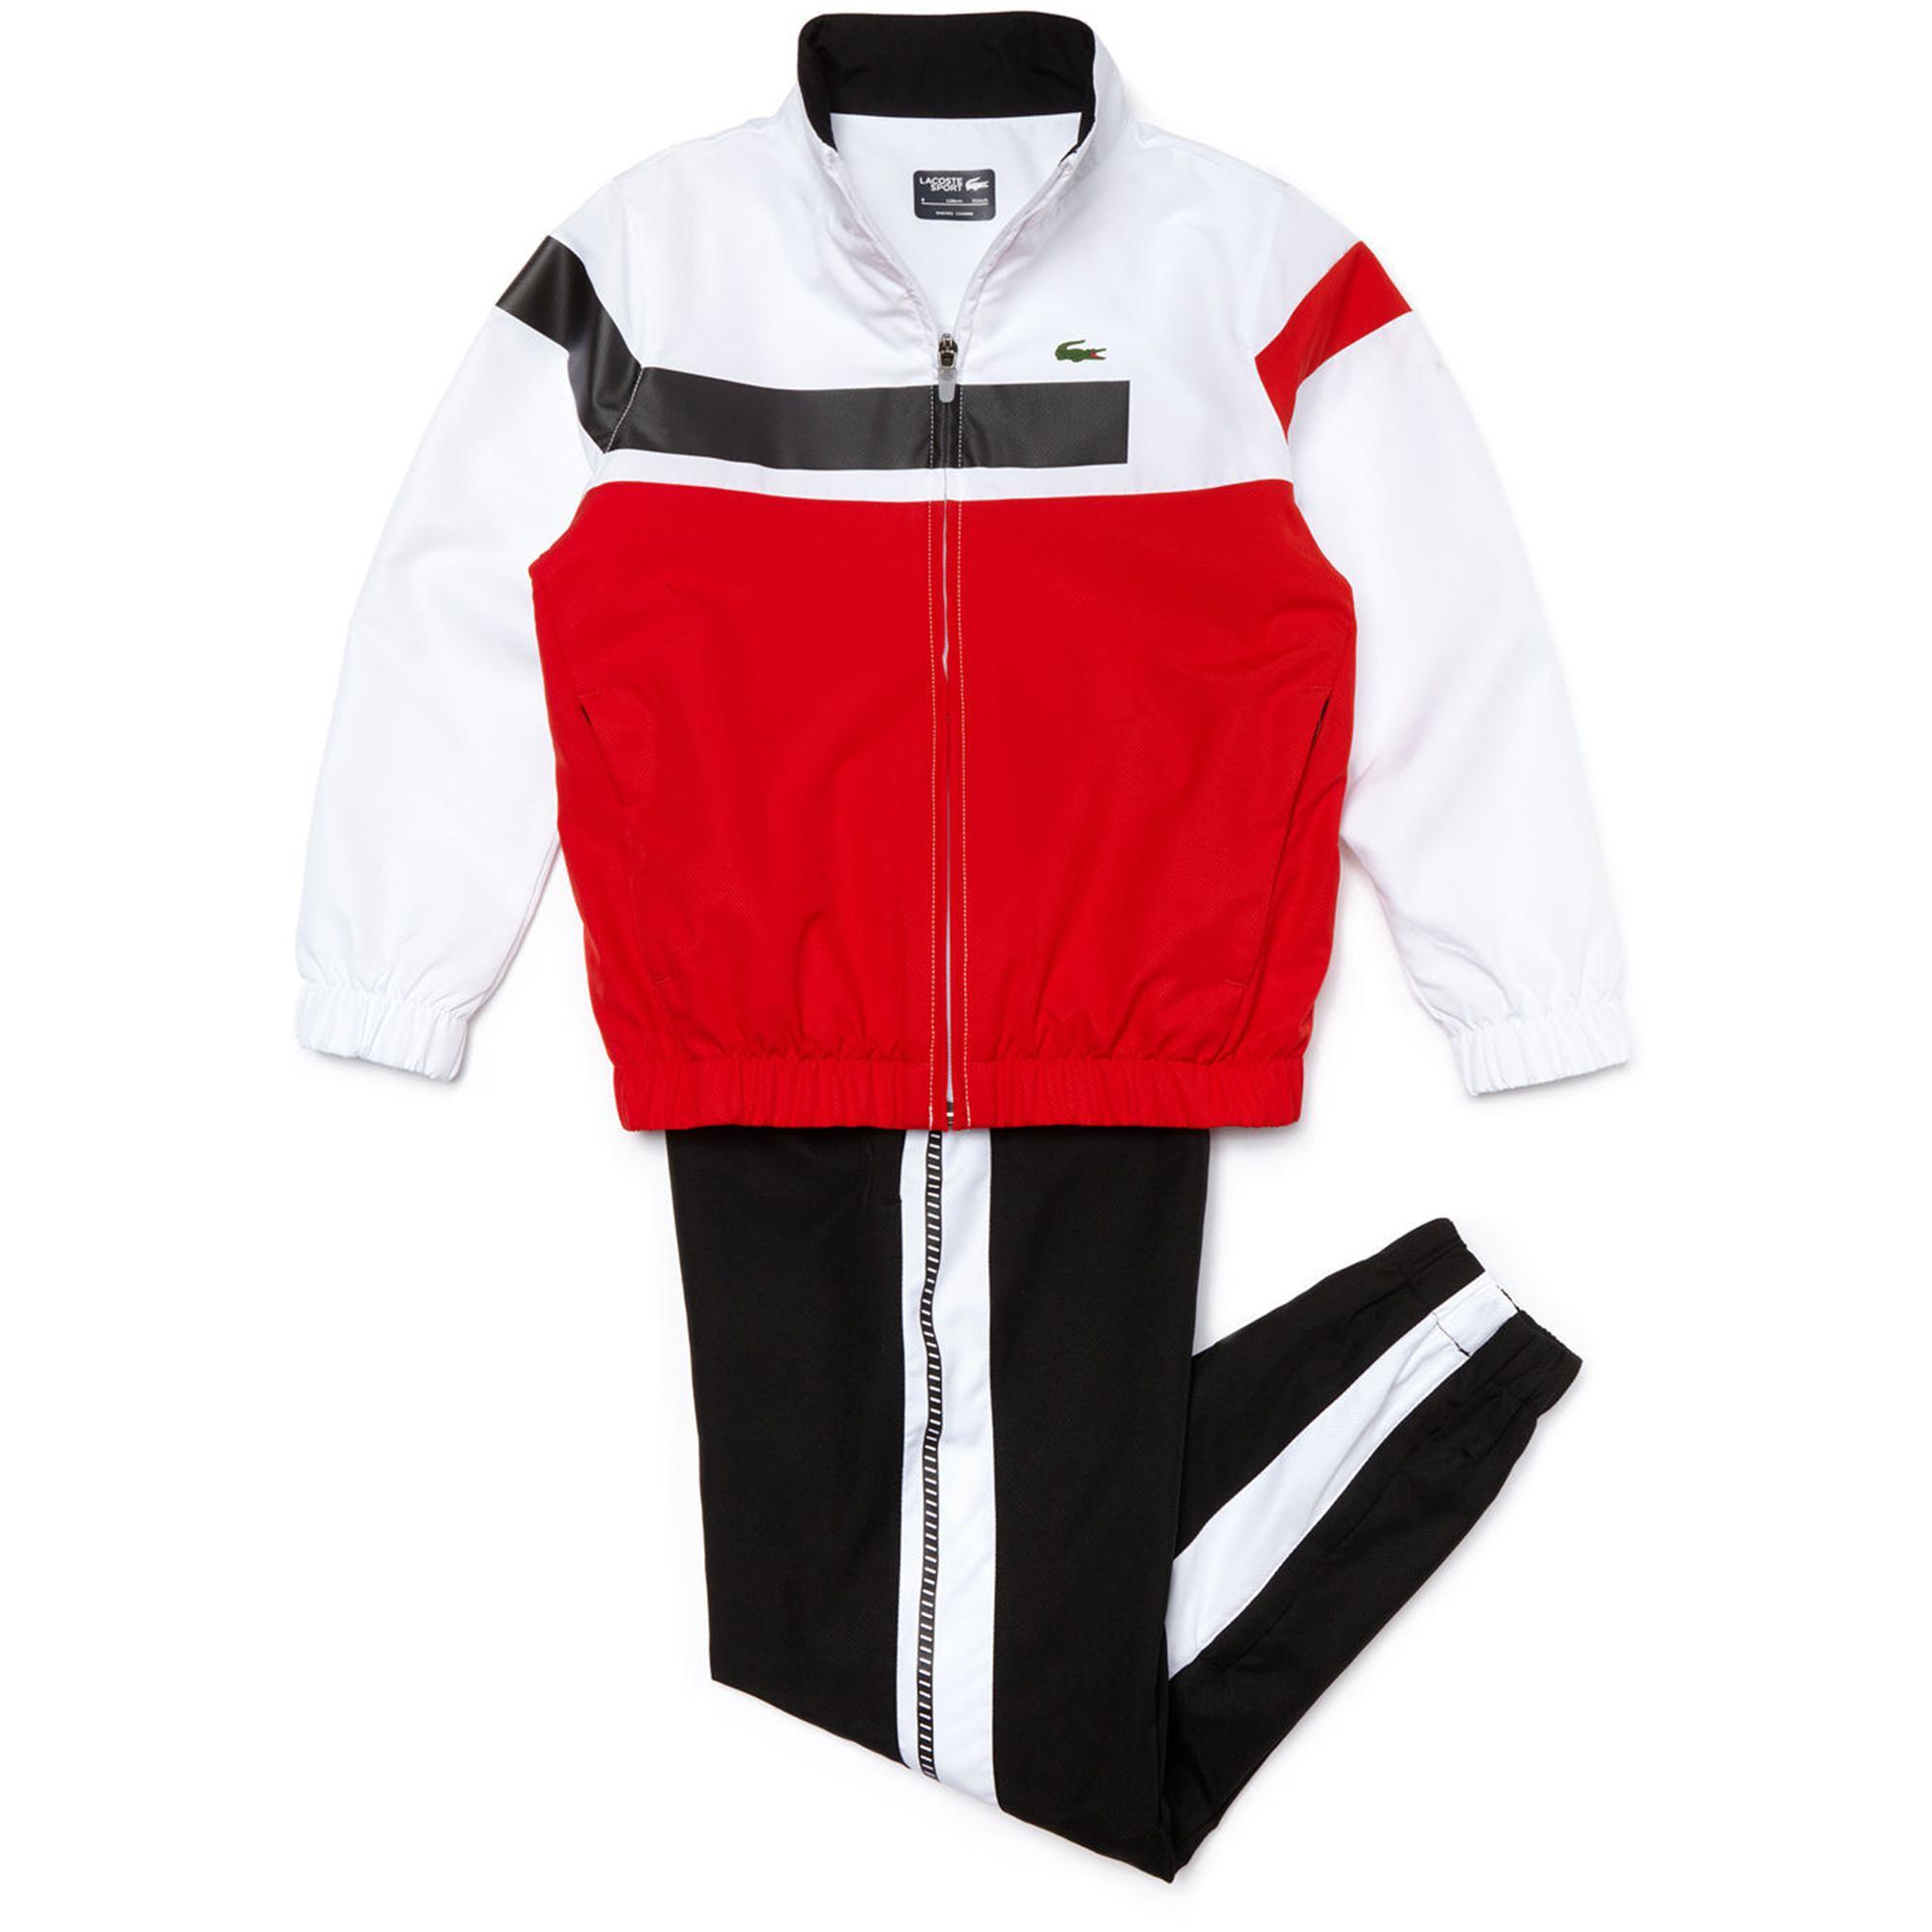 96520c98395ffe Lacoste Sport Boys Tracksuit - Red White Black - Tennisnuts.com